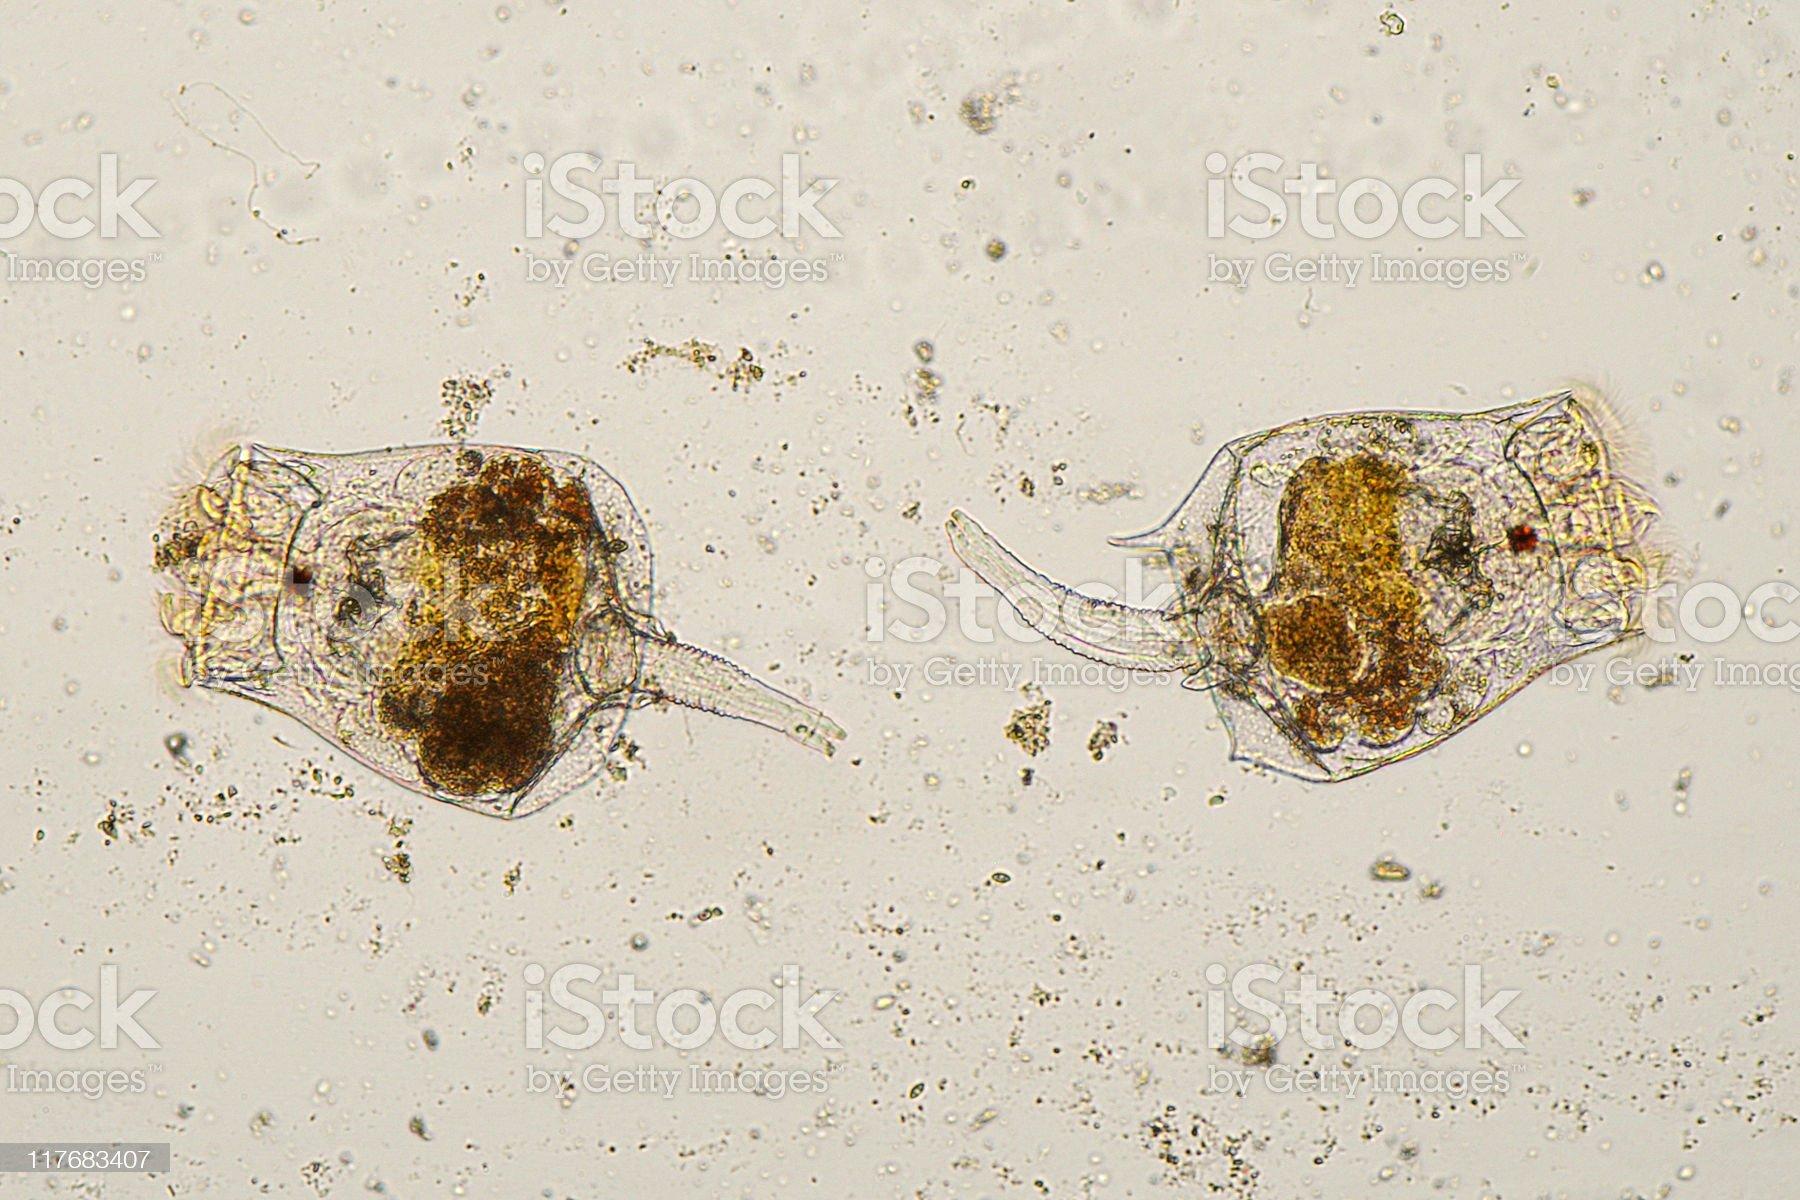 Microscopic image of Rotifers. royalty-free stock photo